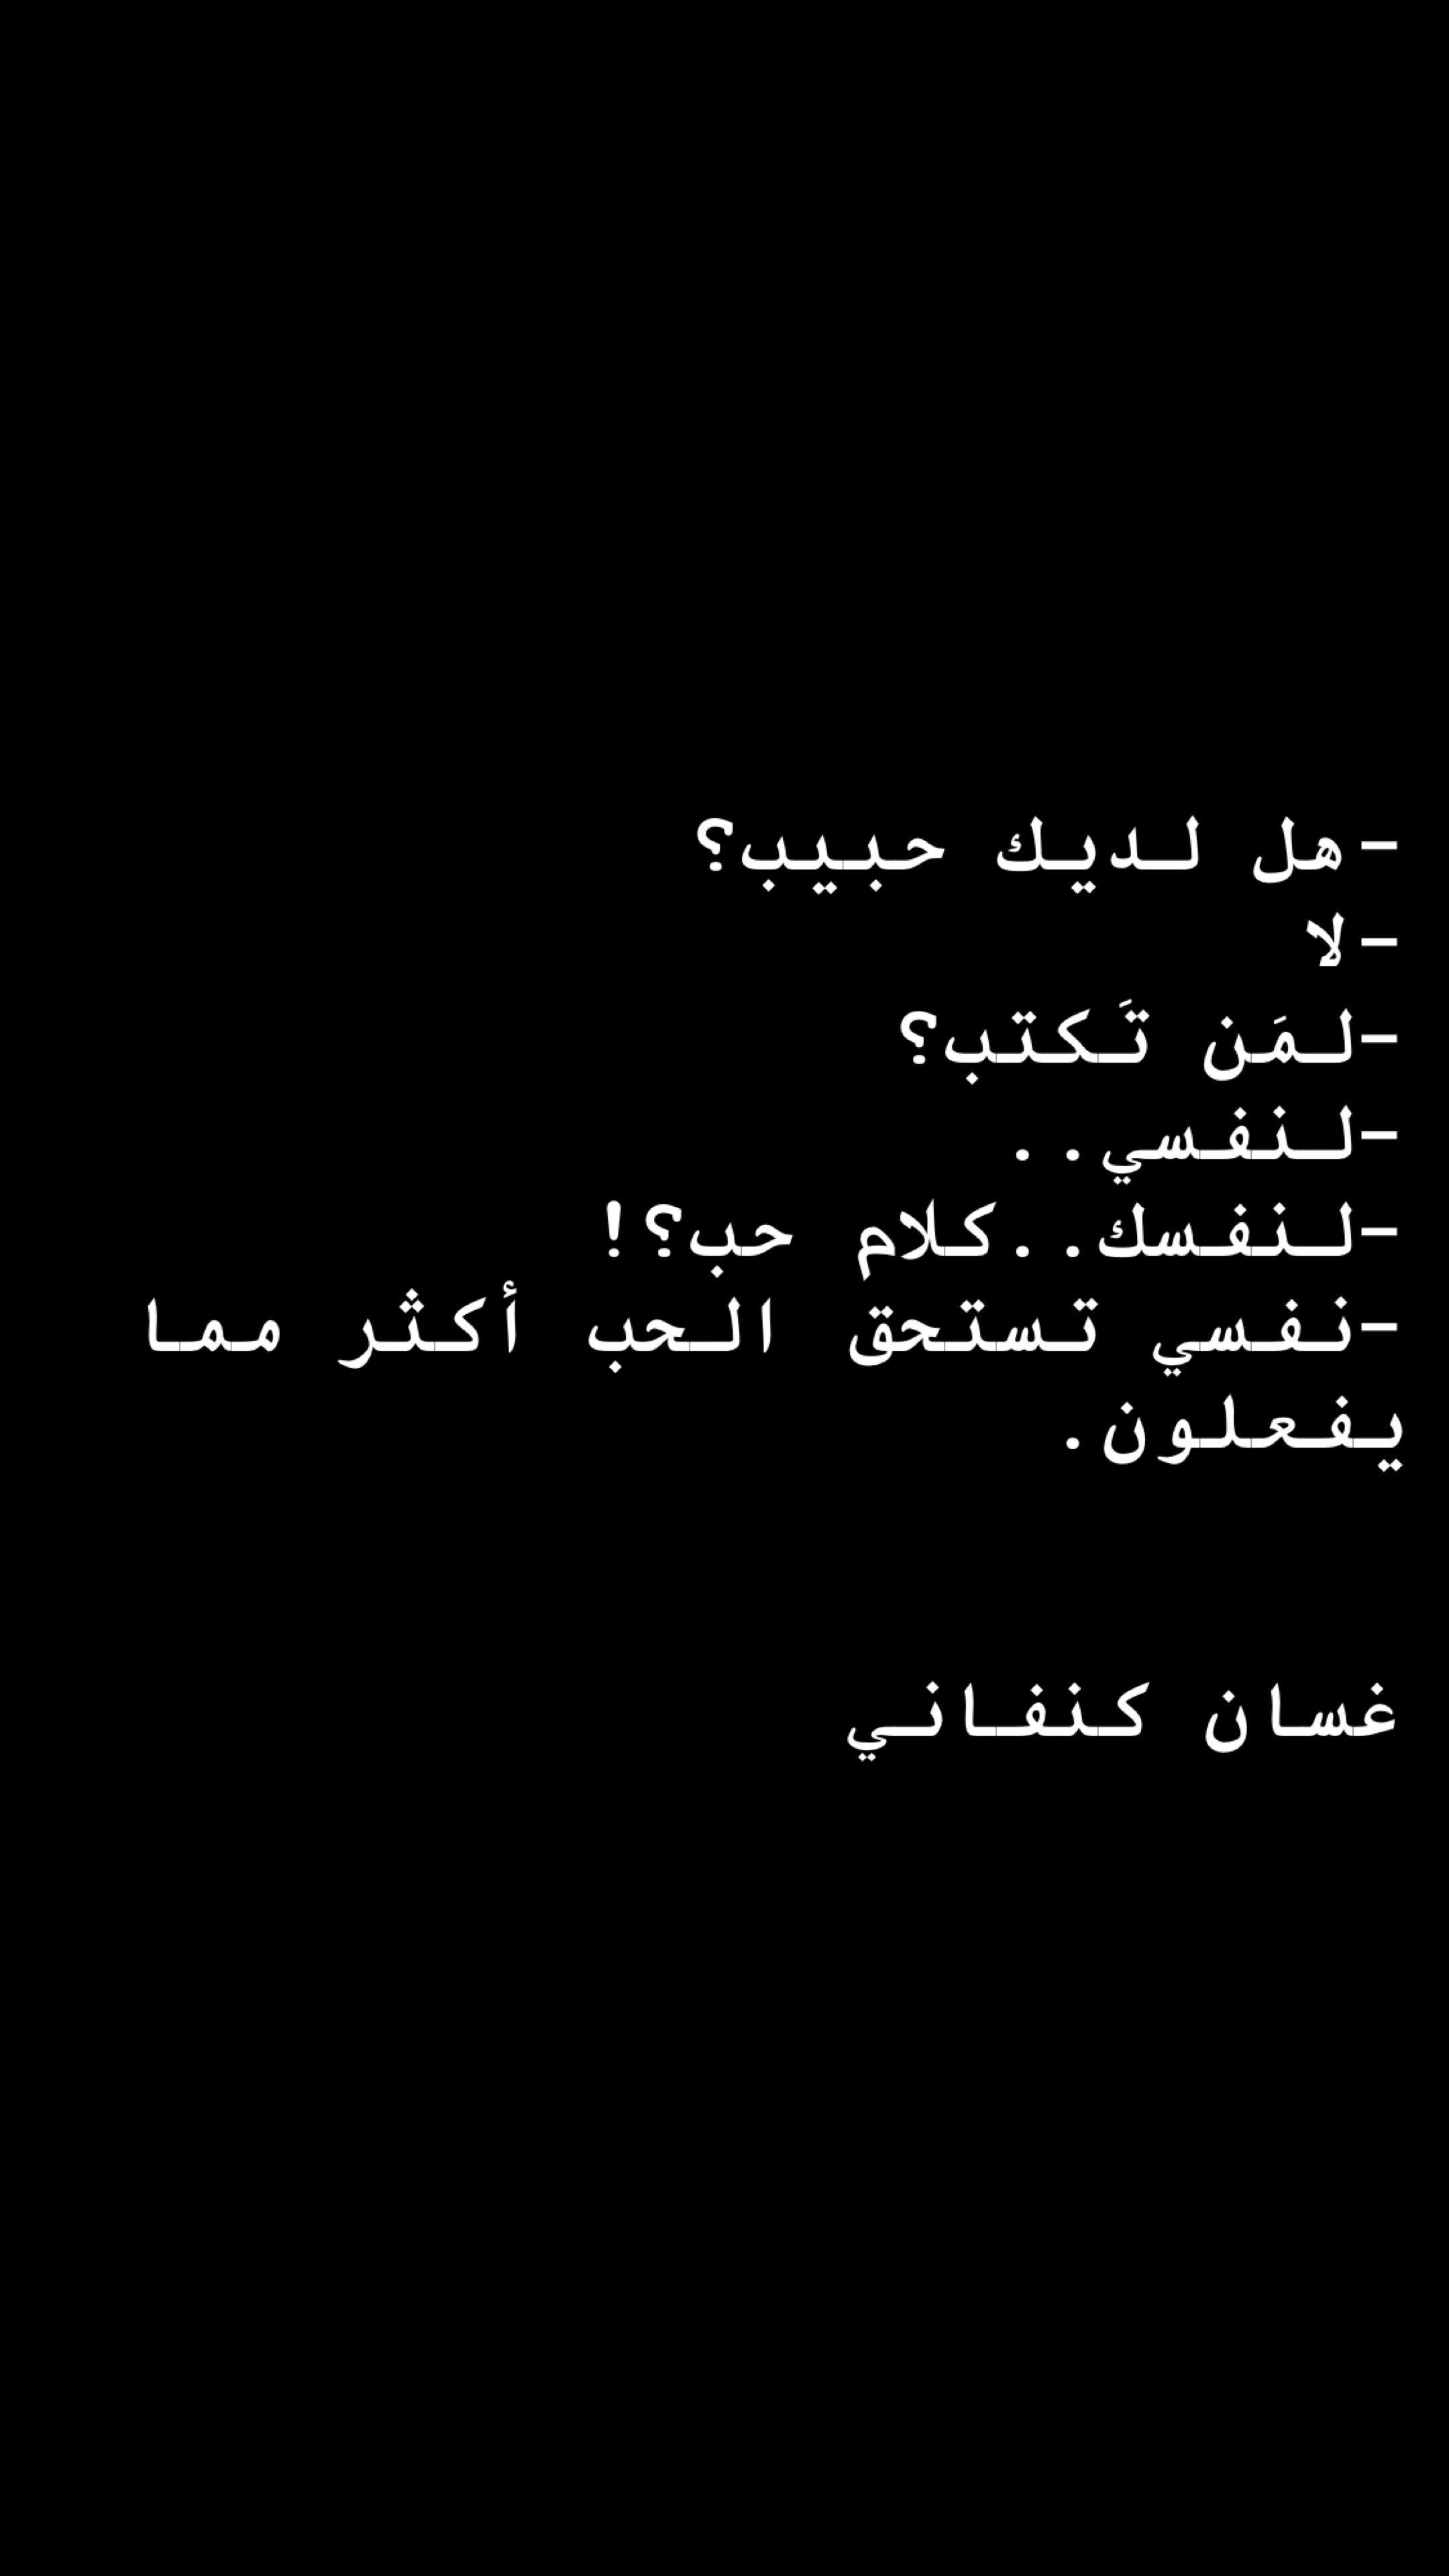 quotes اقتباسات (With images) | Lines quotes